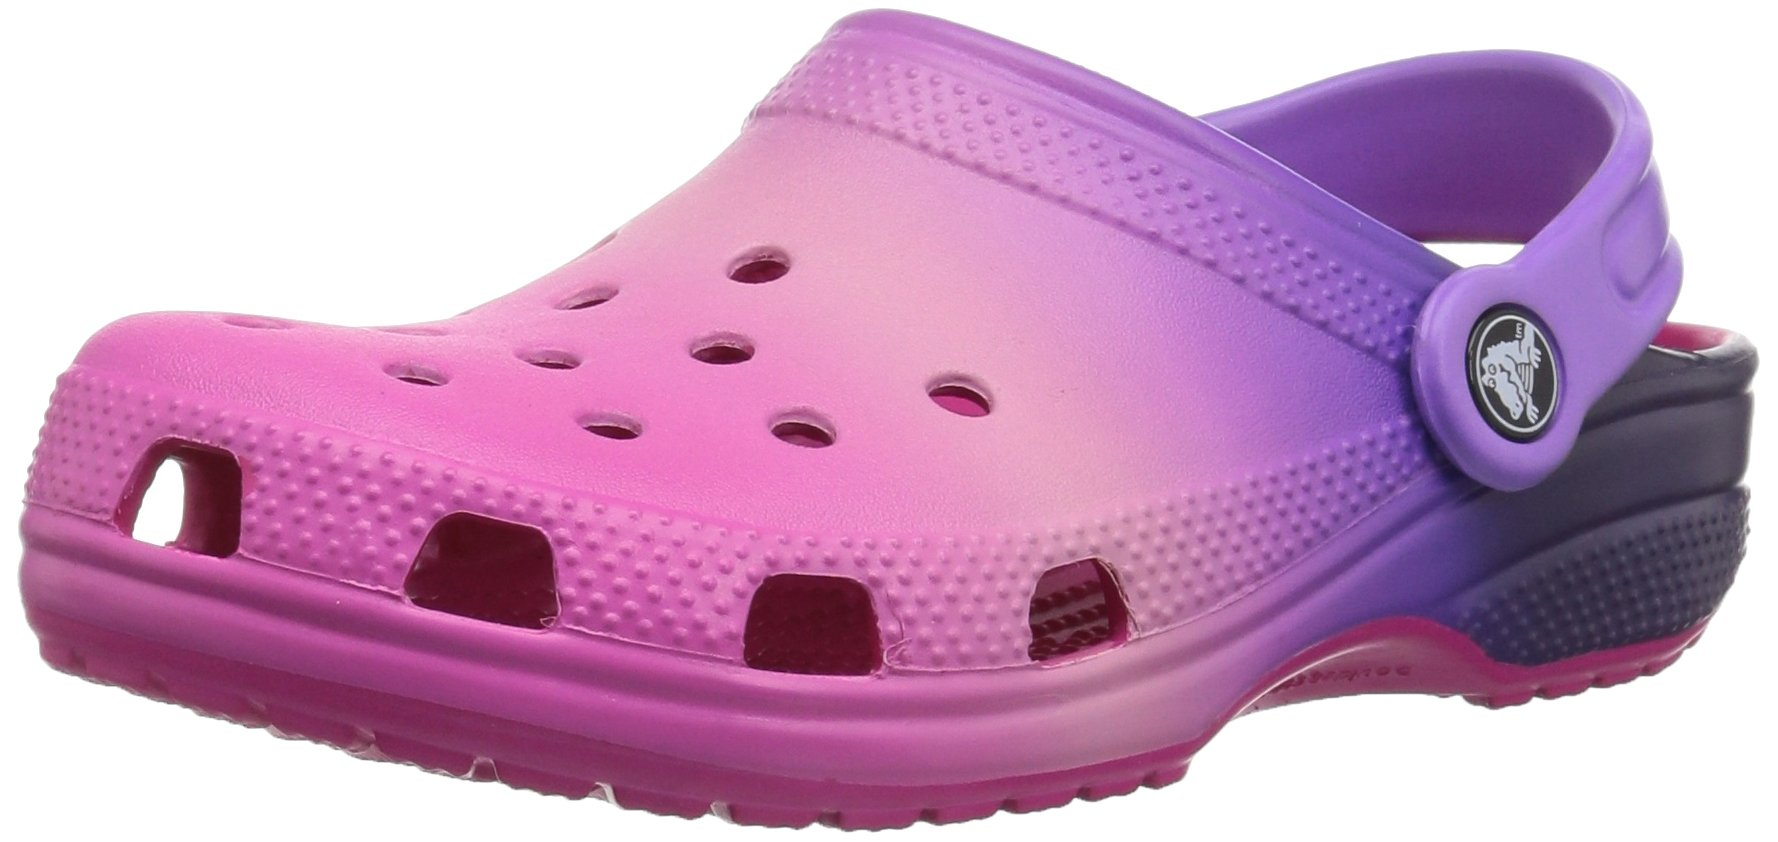 Crocs Unisex Classic Ombre Clog K , pink ombre , C9 M US Toddler